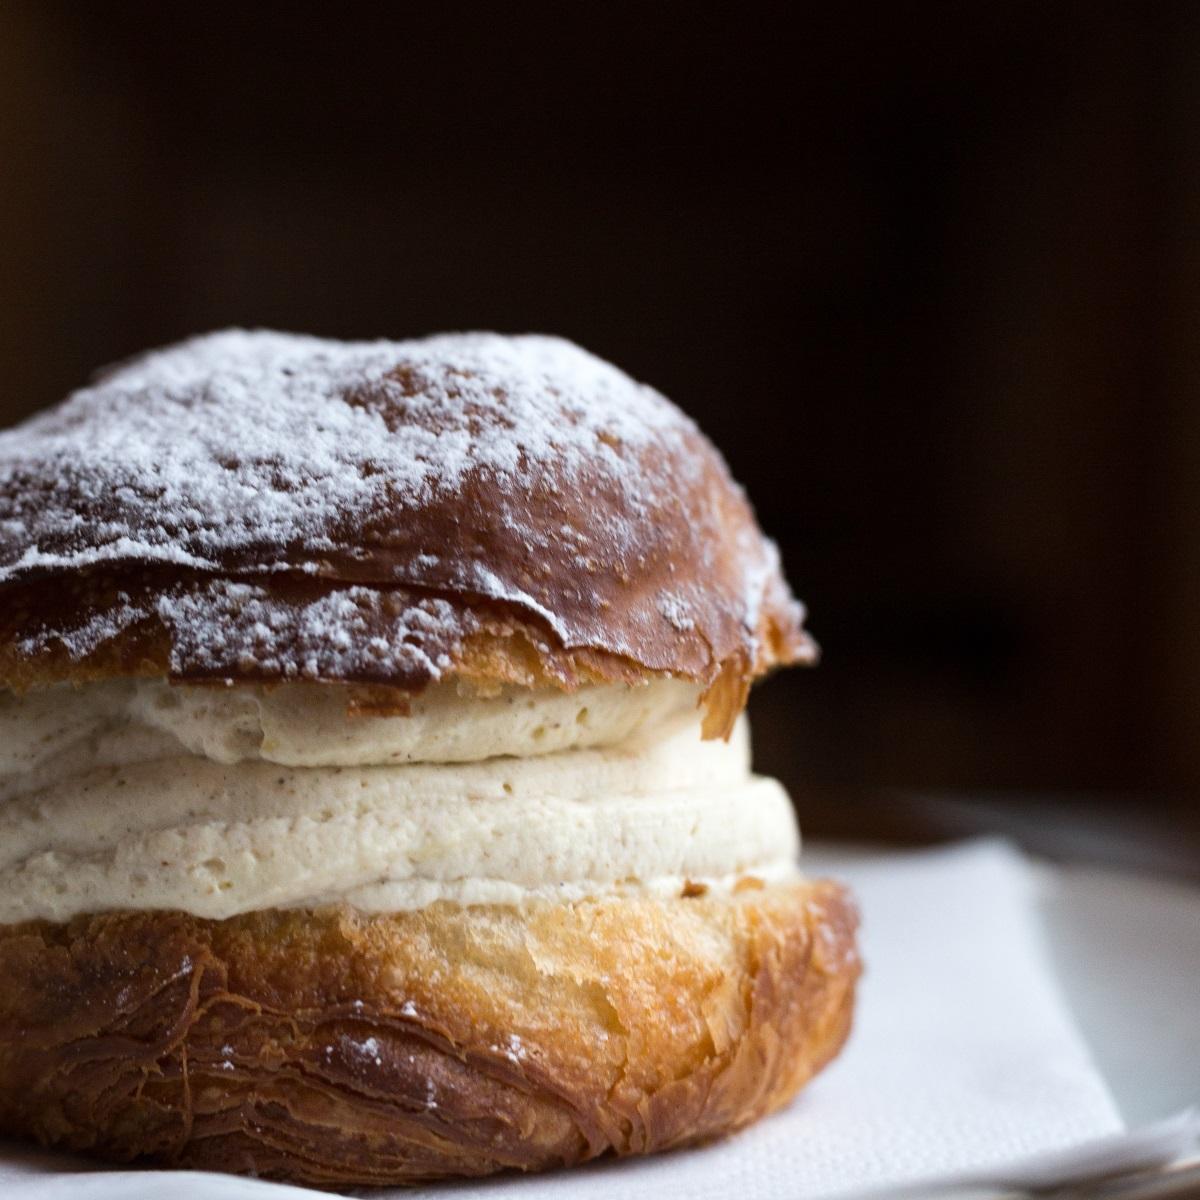 Backwaren_Bäckerei und Café Mirabelle in Kopenhagen